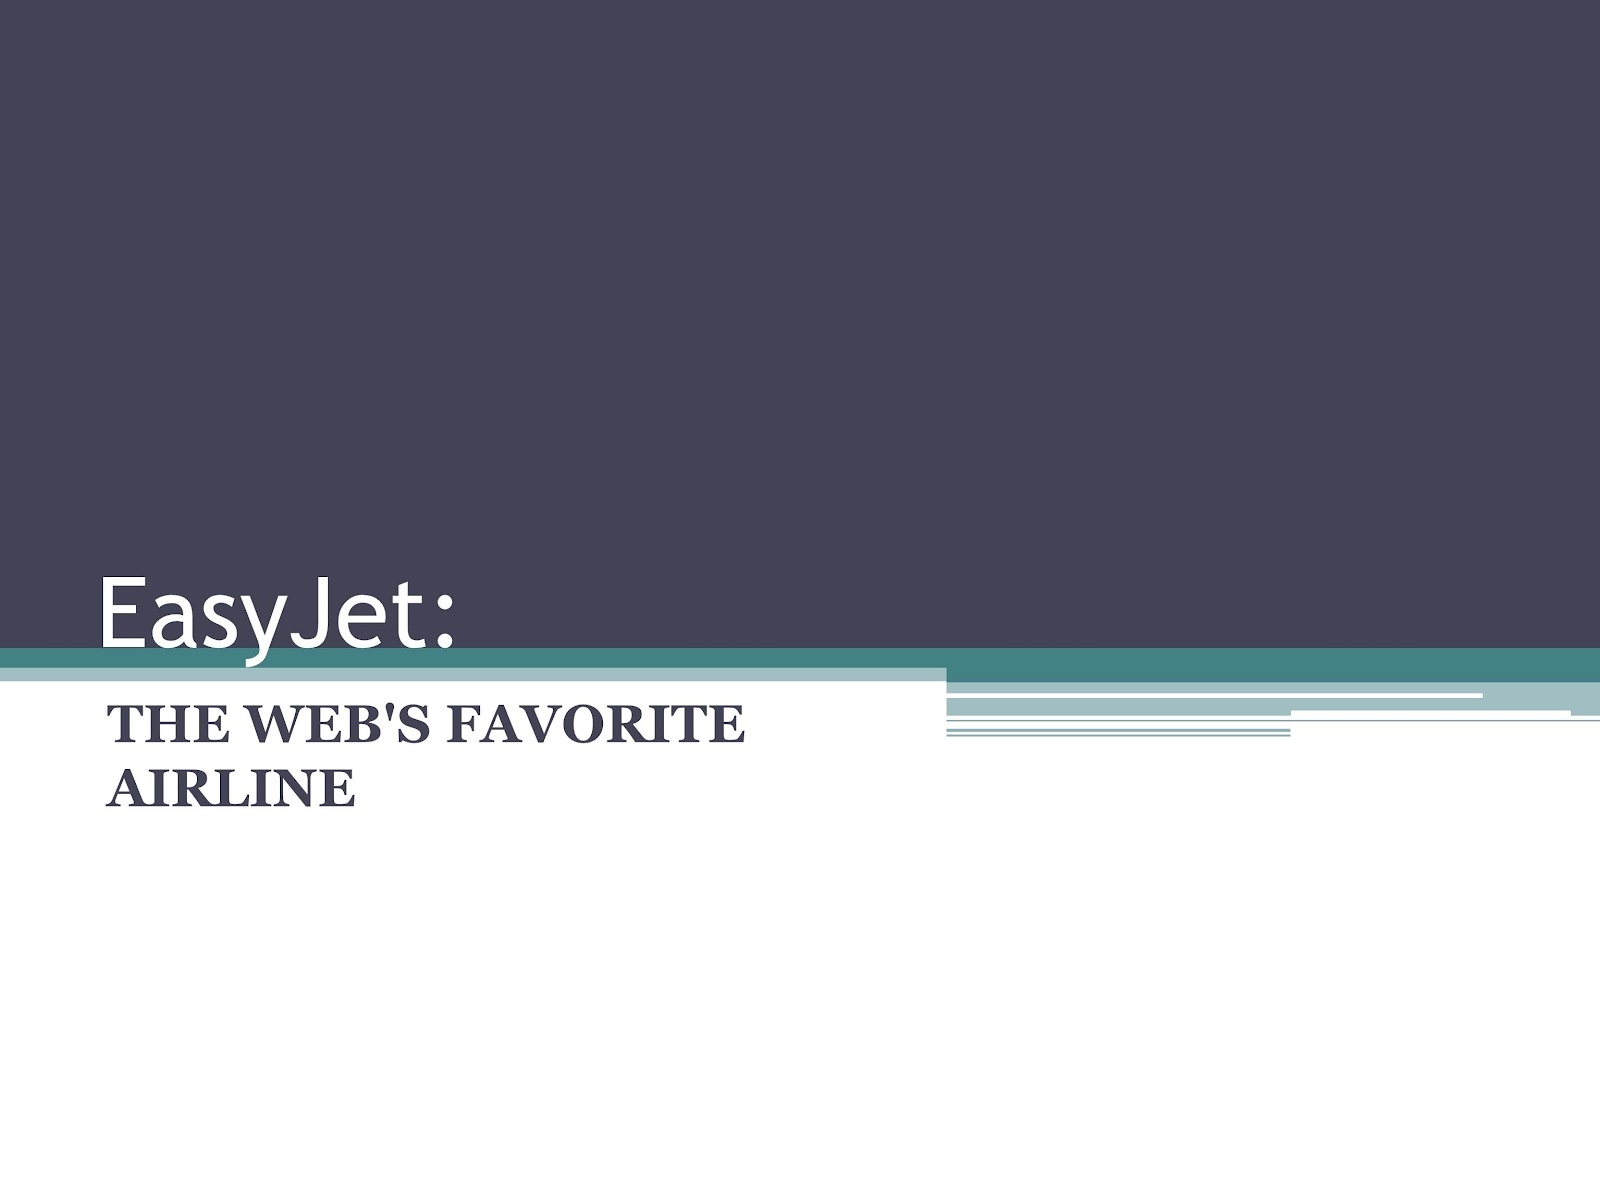 easy jet the webs favorite airline essay